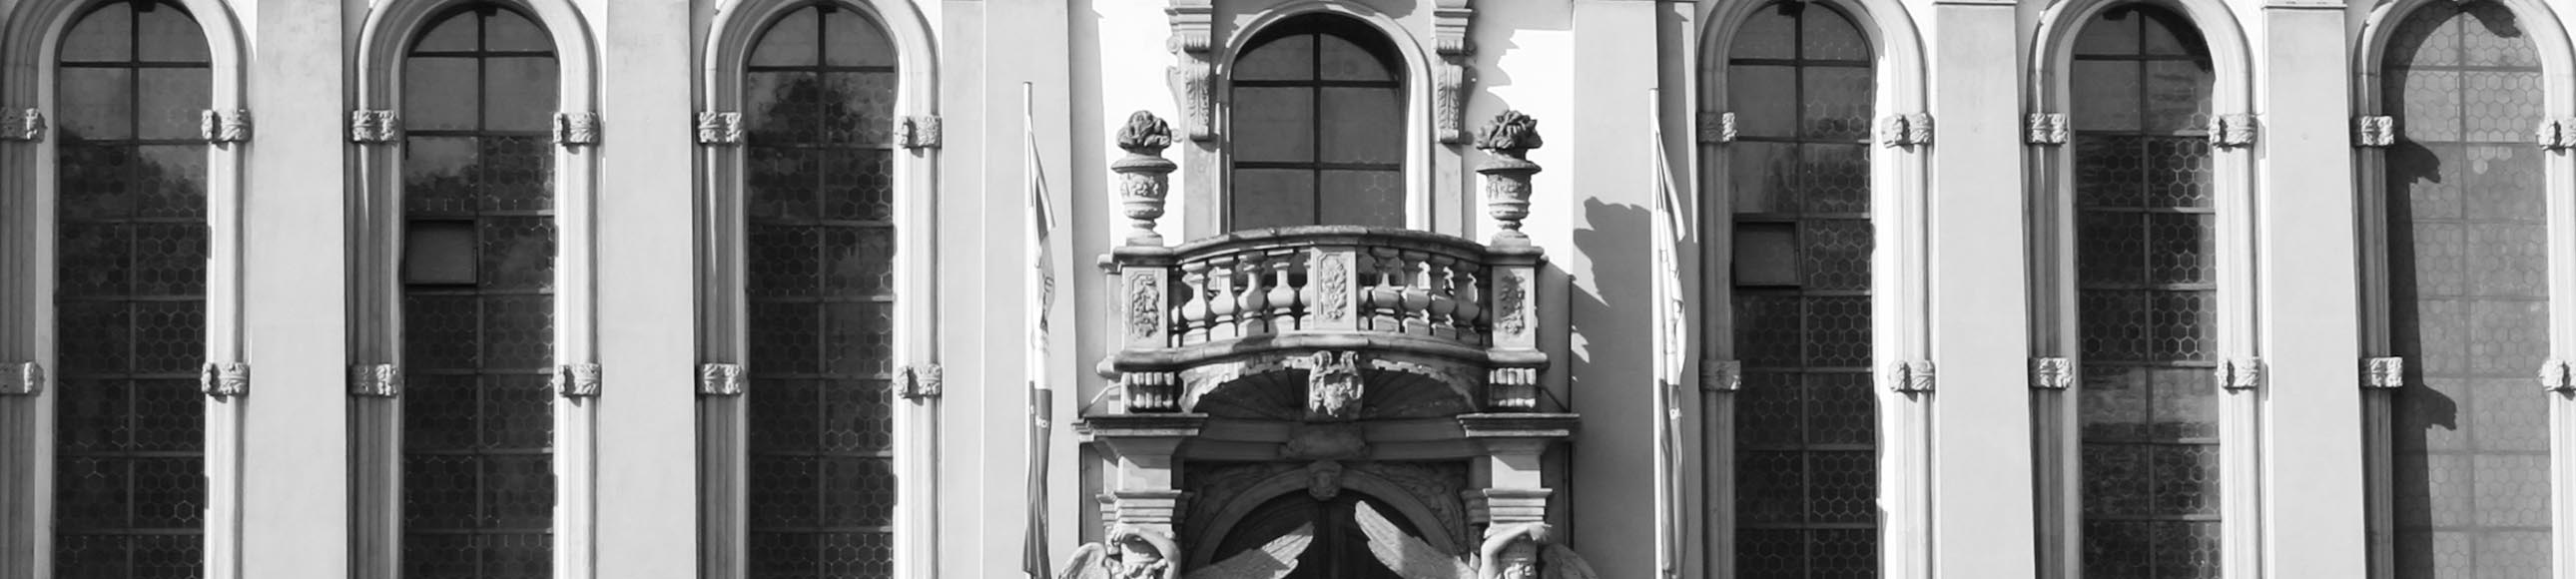 Altes Rathaus, St. Sebastian, Mannheim